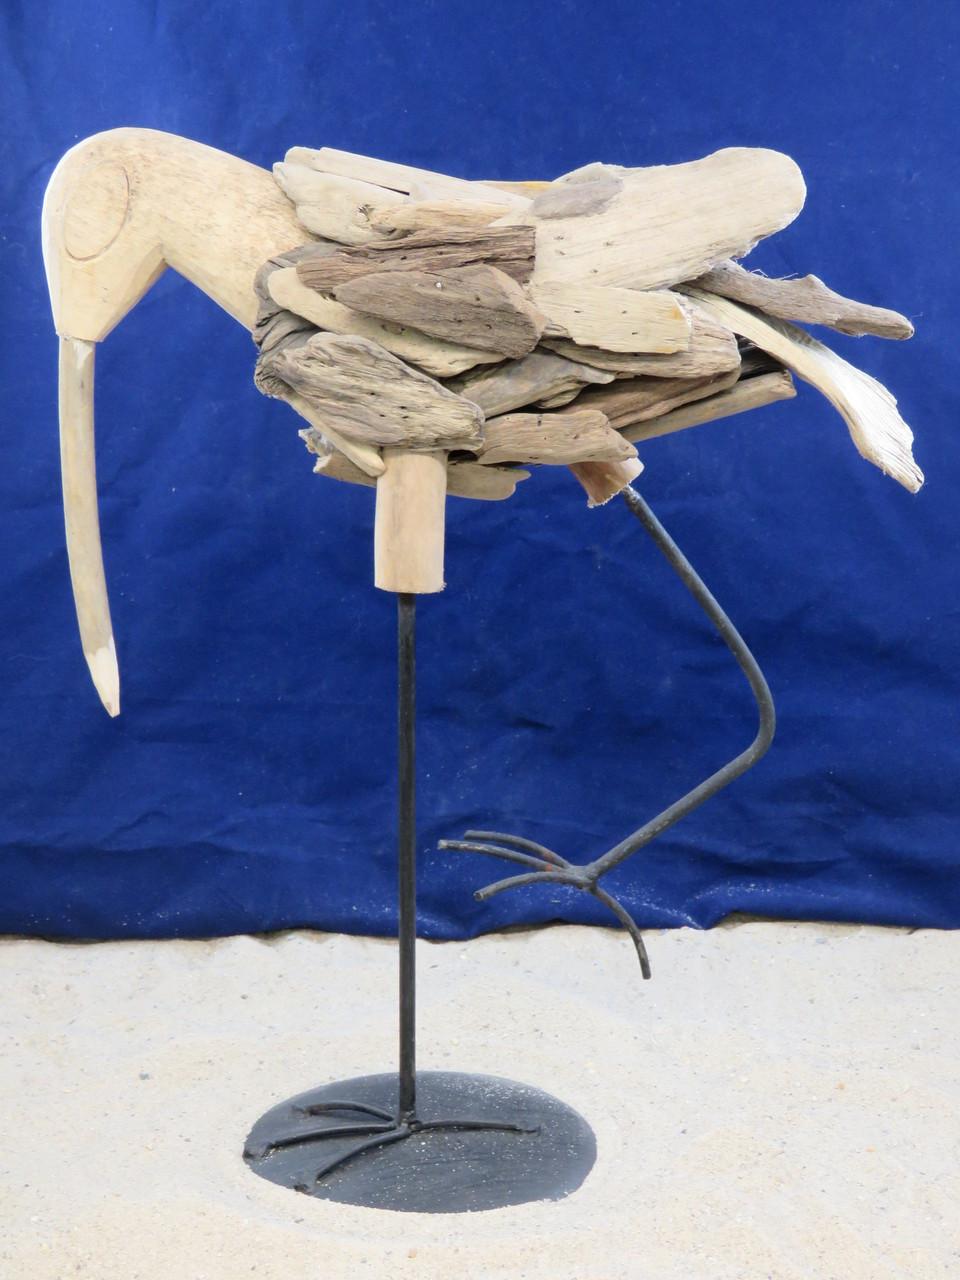 Driftwood Shorebird Sandpiper Egret Heron Sculpture Weathered Wood Coastal Beach Decor